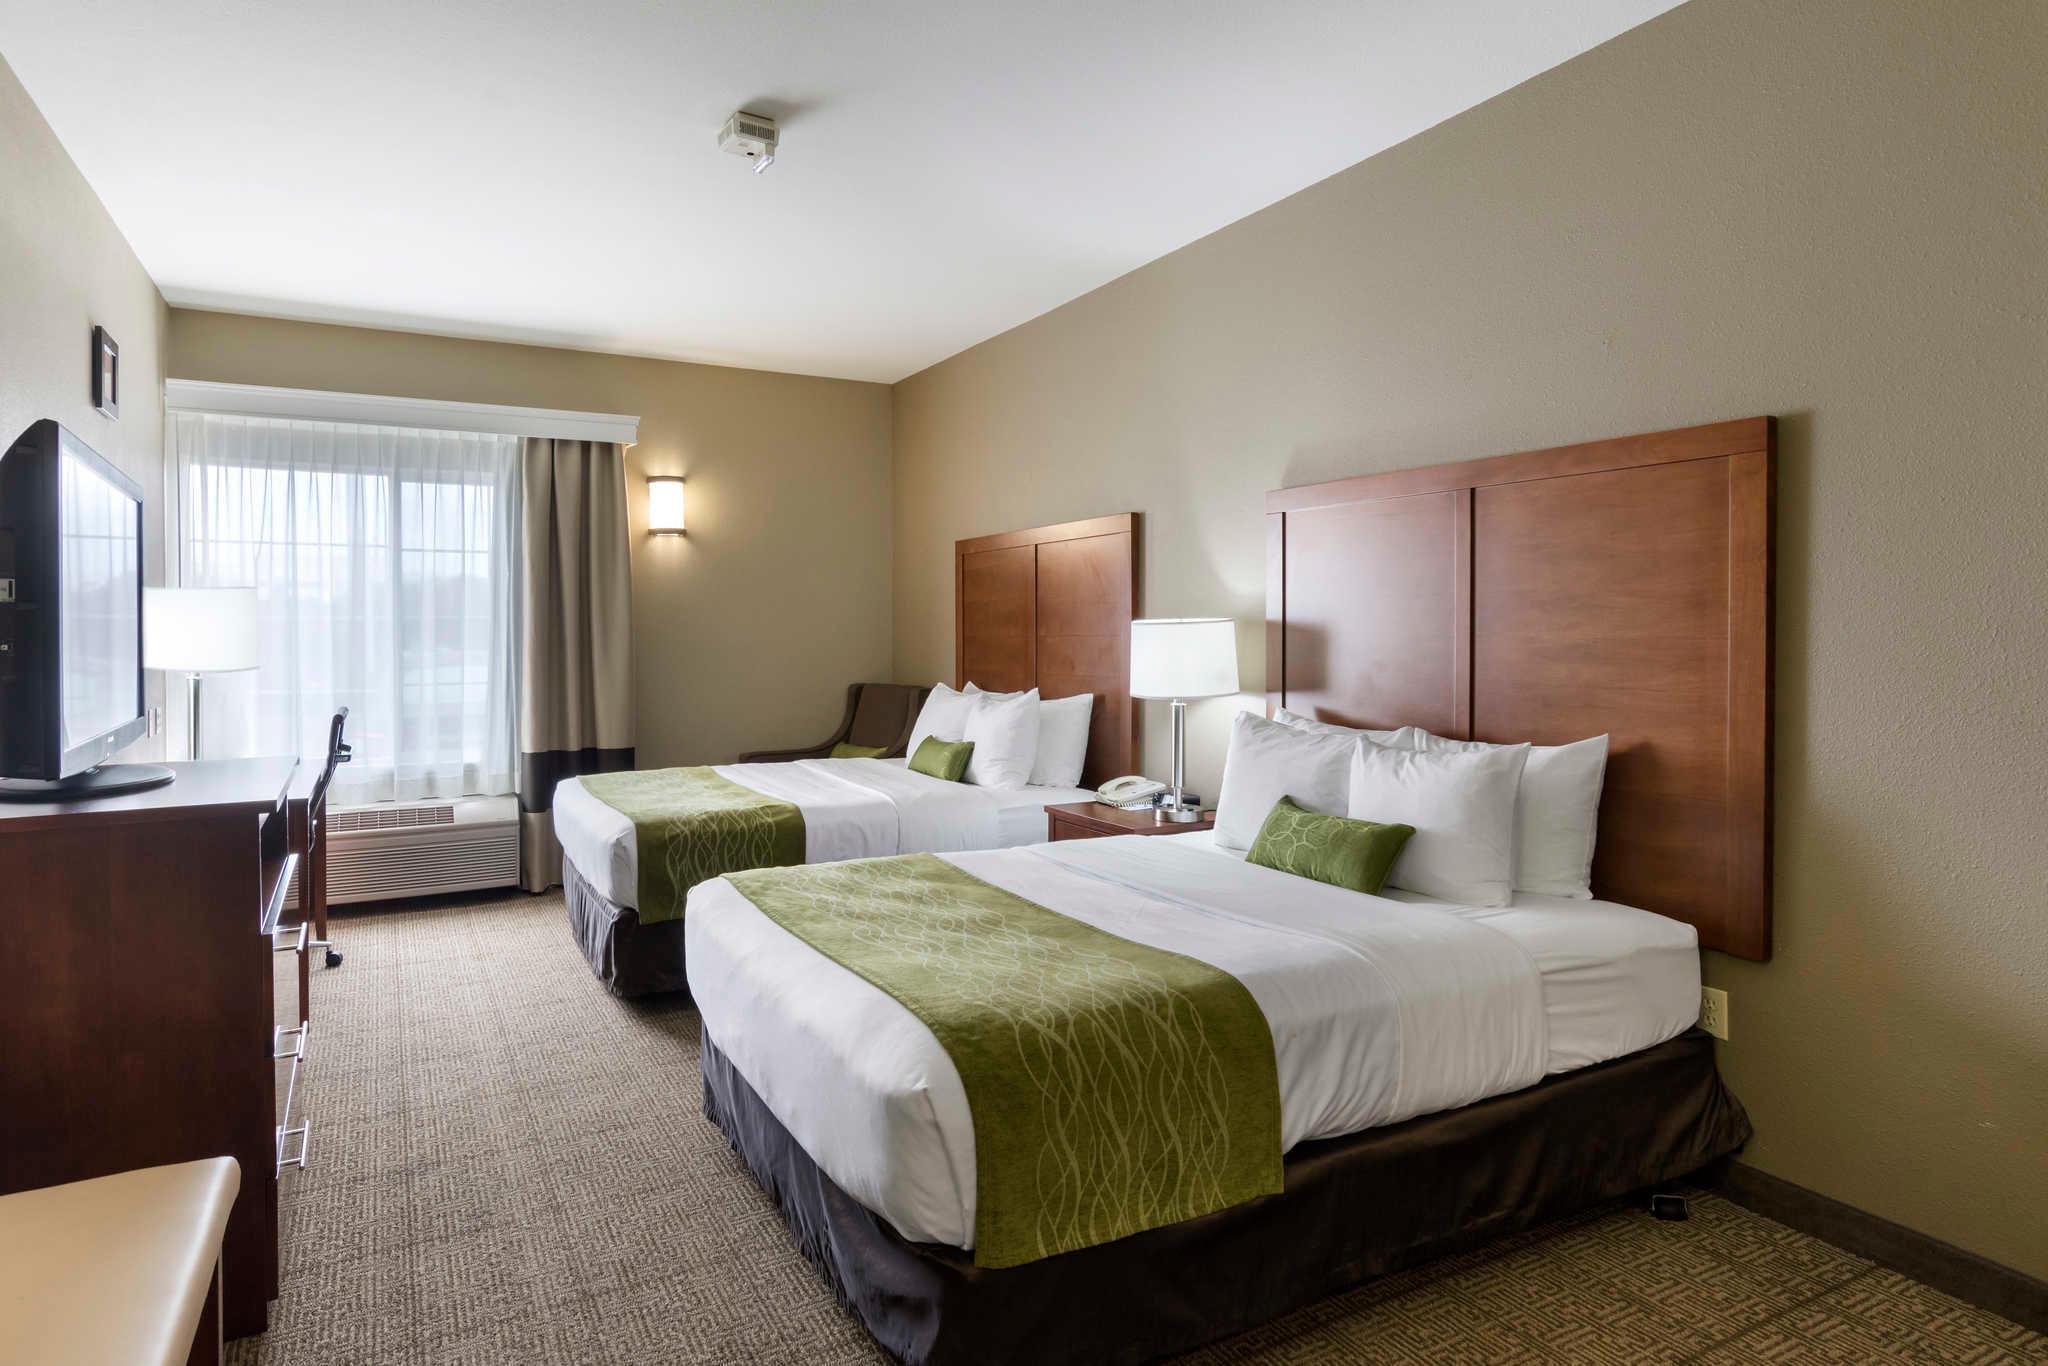 Comfort Inn & Suites Sacramento - University Area image 15